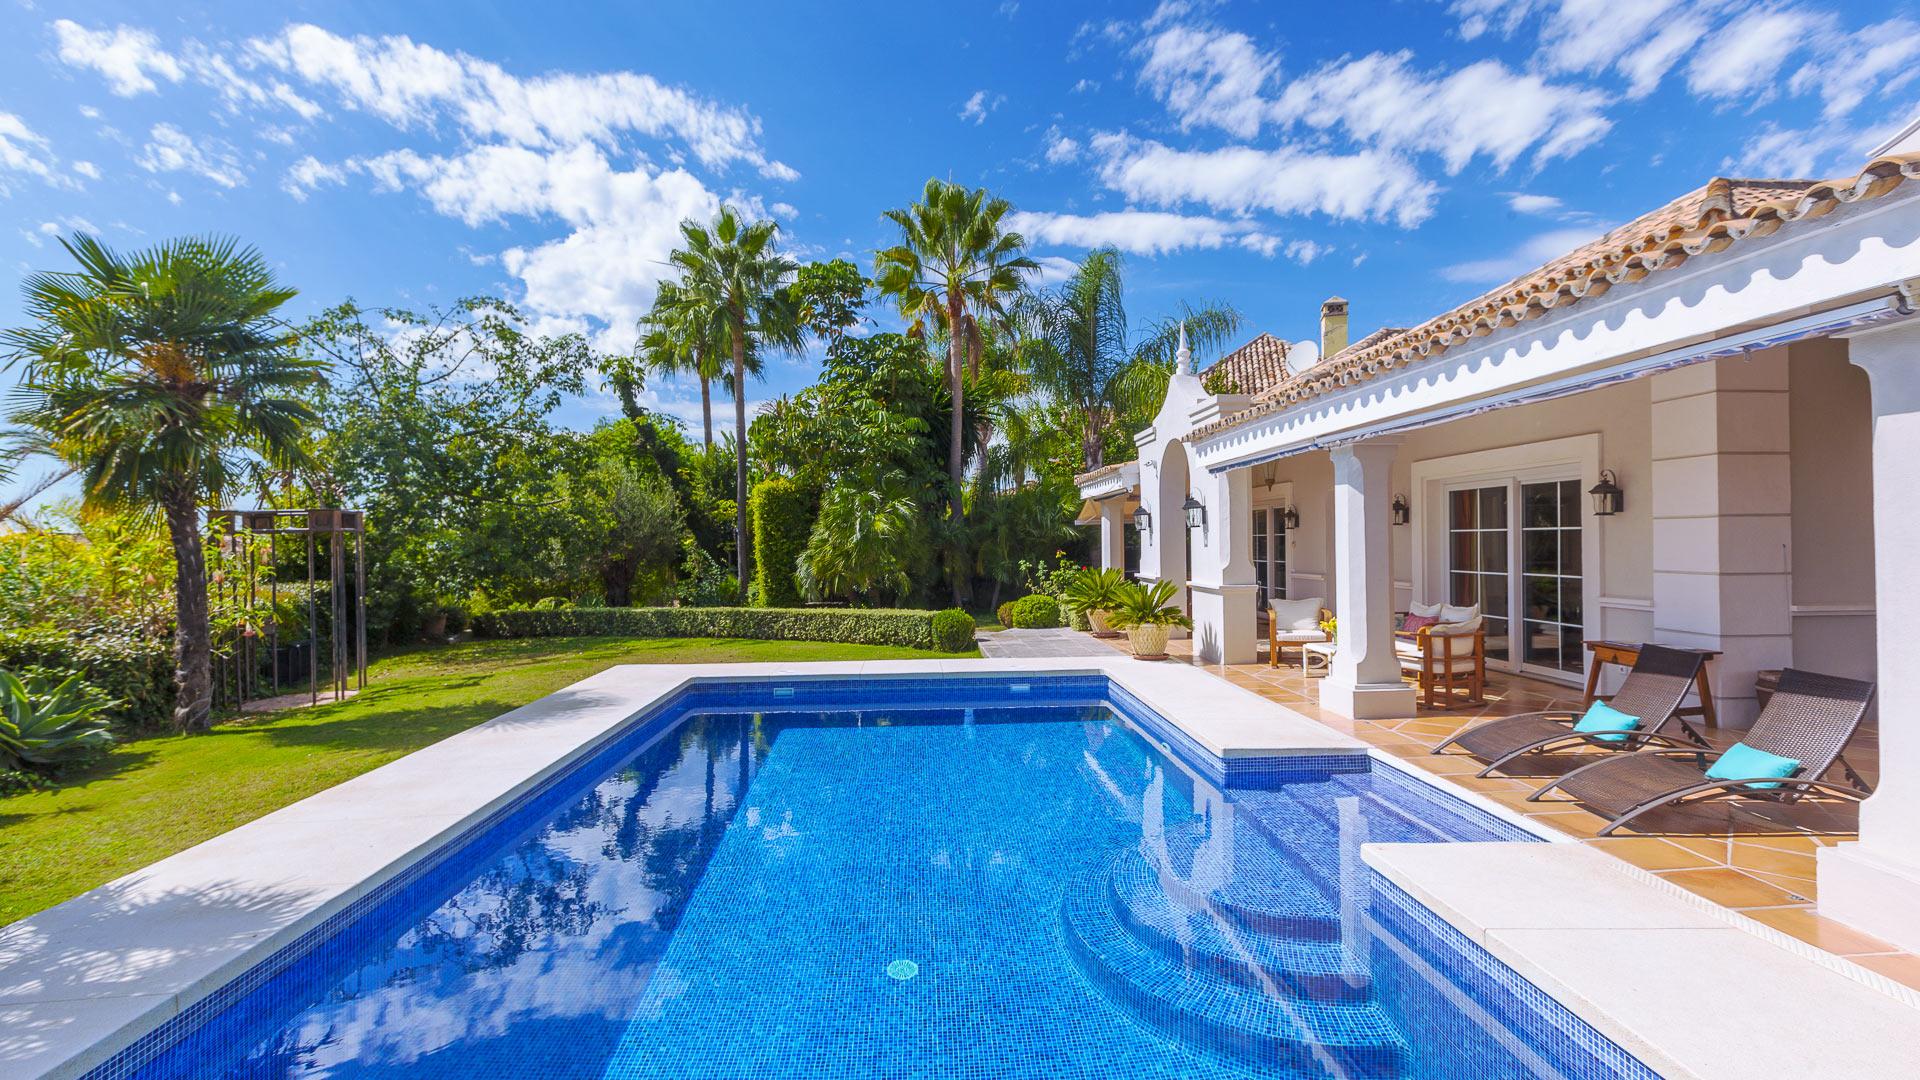 Villa Villa Florencia, Rental in Andalusia